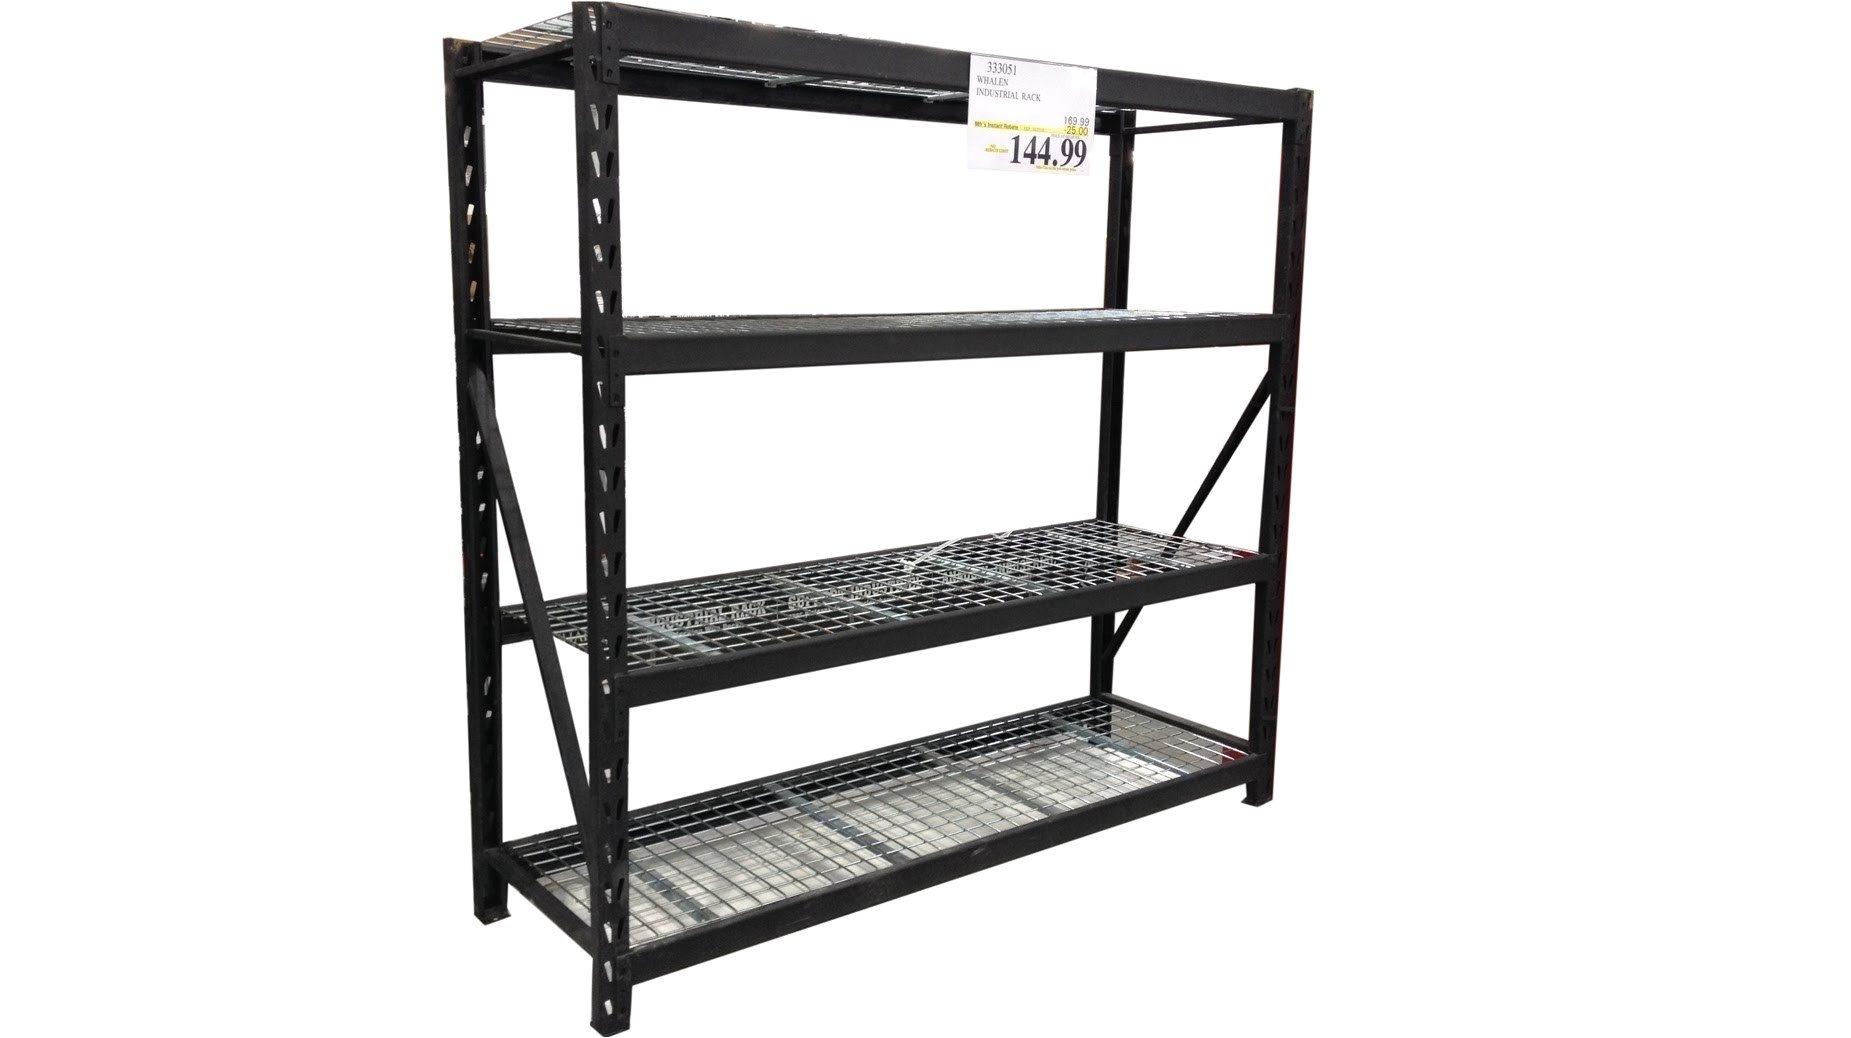 6 Shelf Wire Rack Costco Whalen Industrie Rack Zuhause Inspiration Design